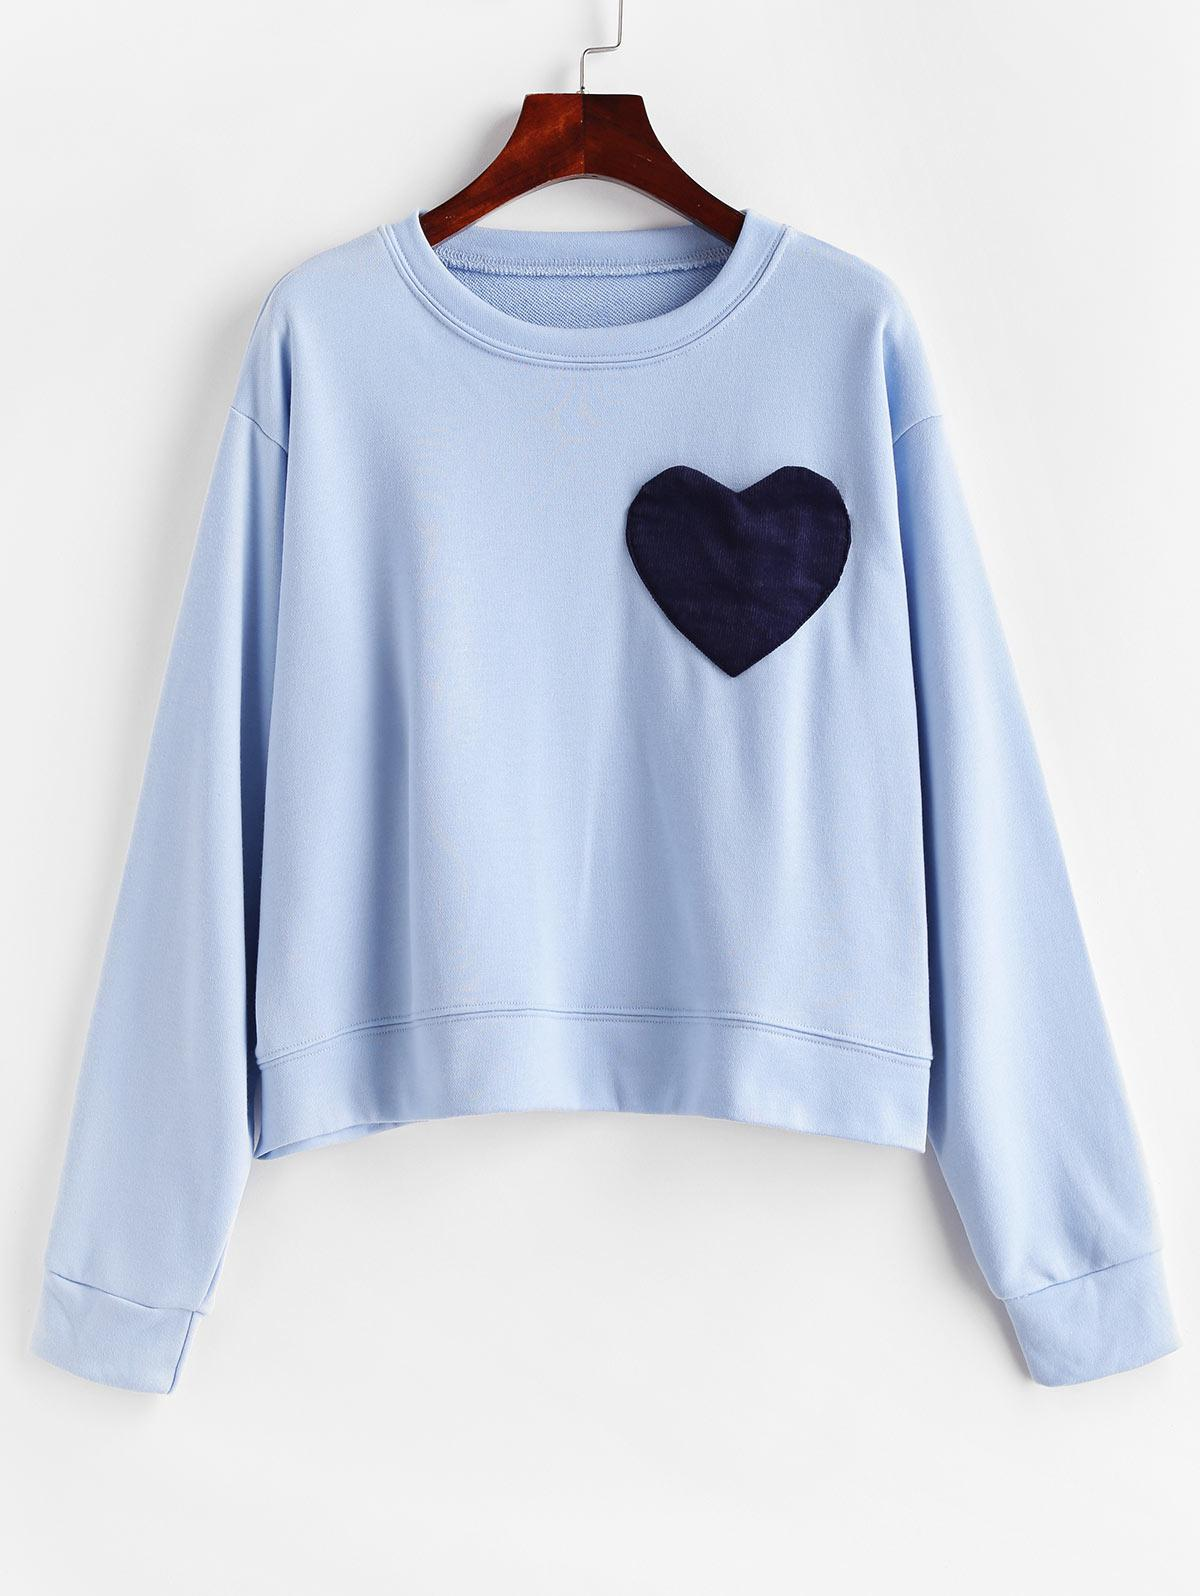 Corduroy Heart Pocket French Terry Drop Shoulder Sweatshirt